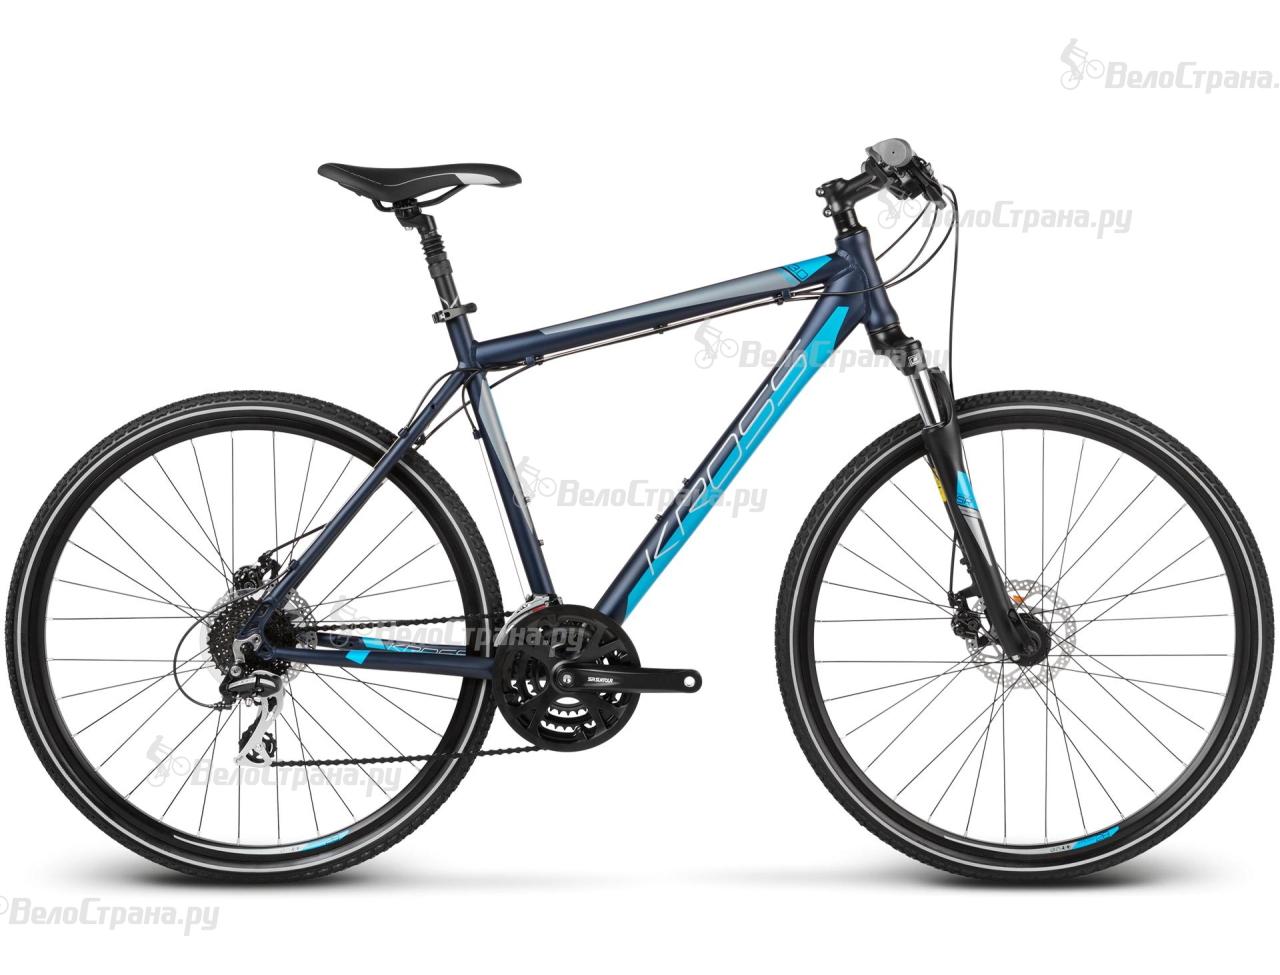 Велосипед Kross Evado 3.0 (2017) велосипед kross evado 1 0 lady 2017